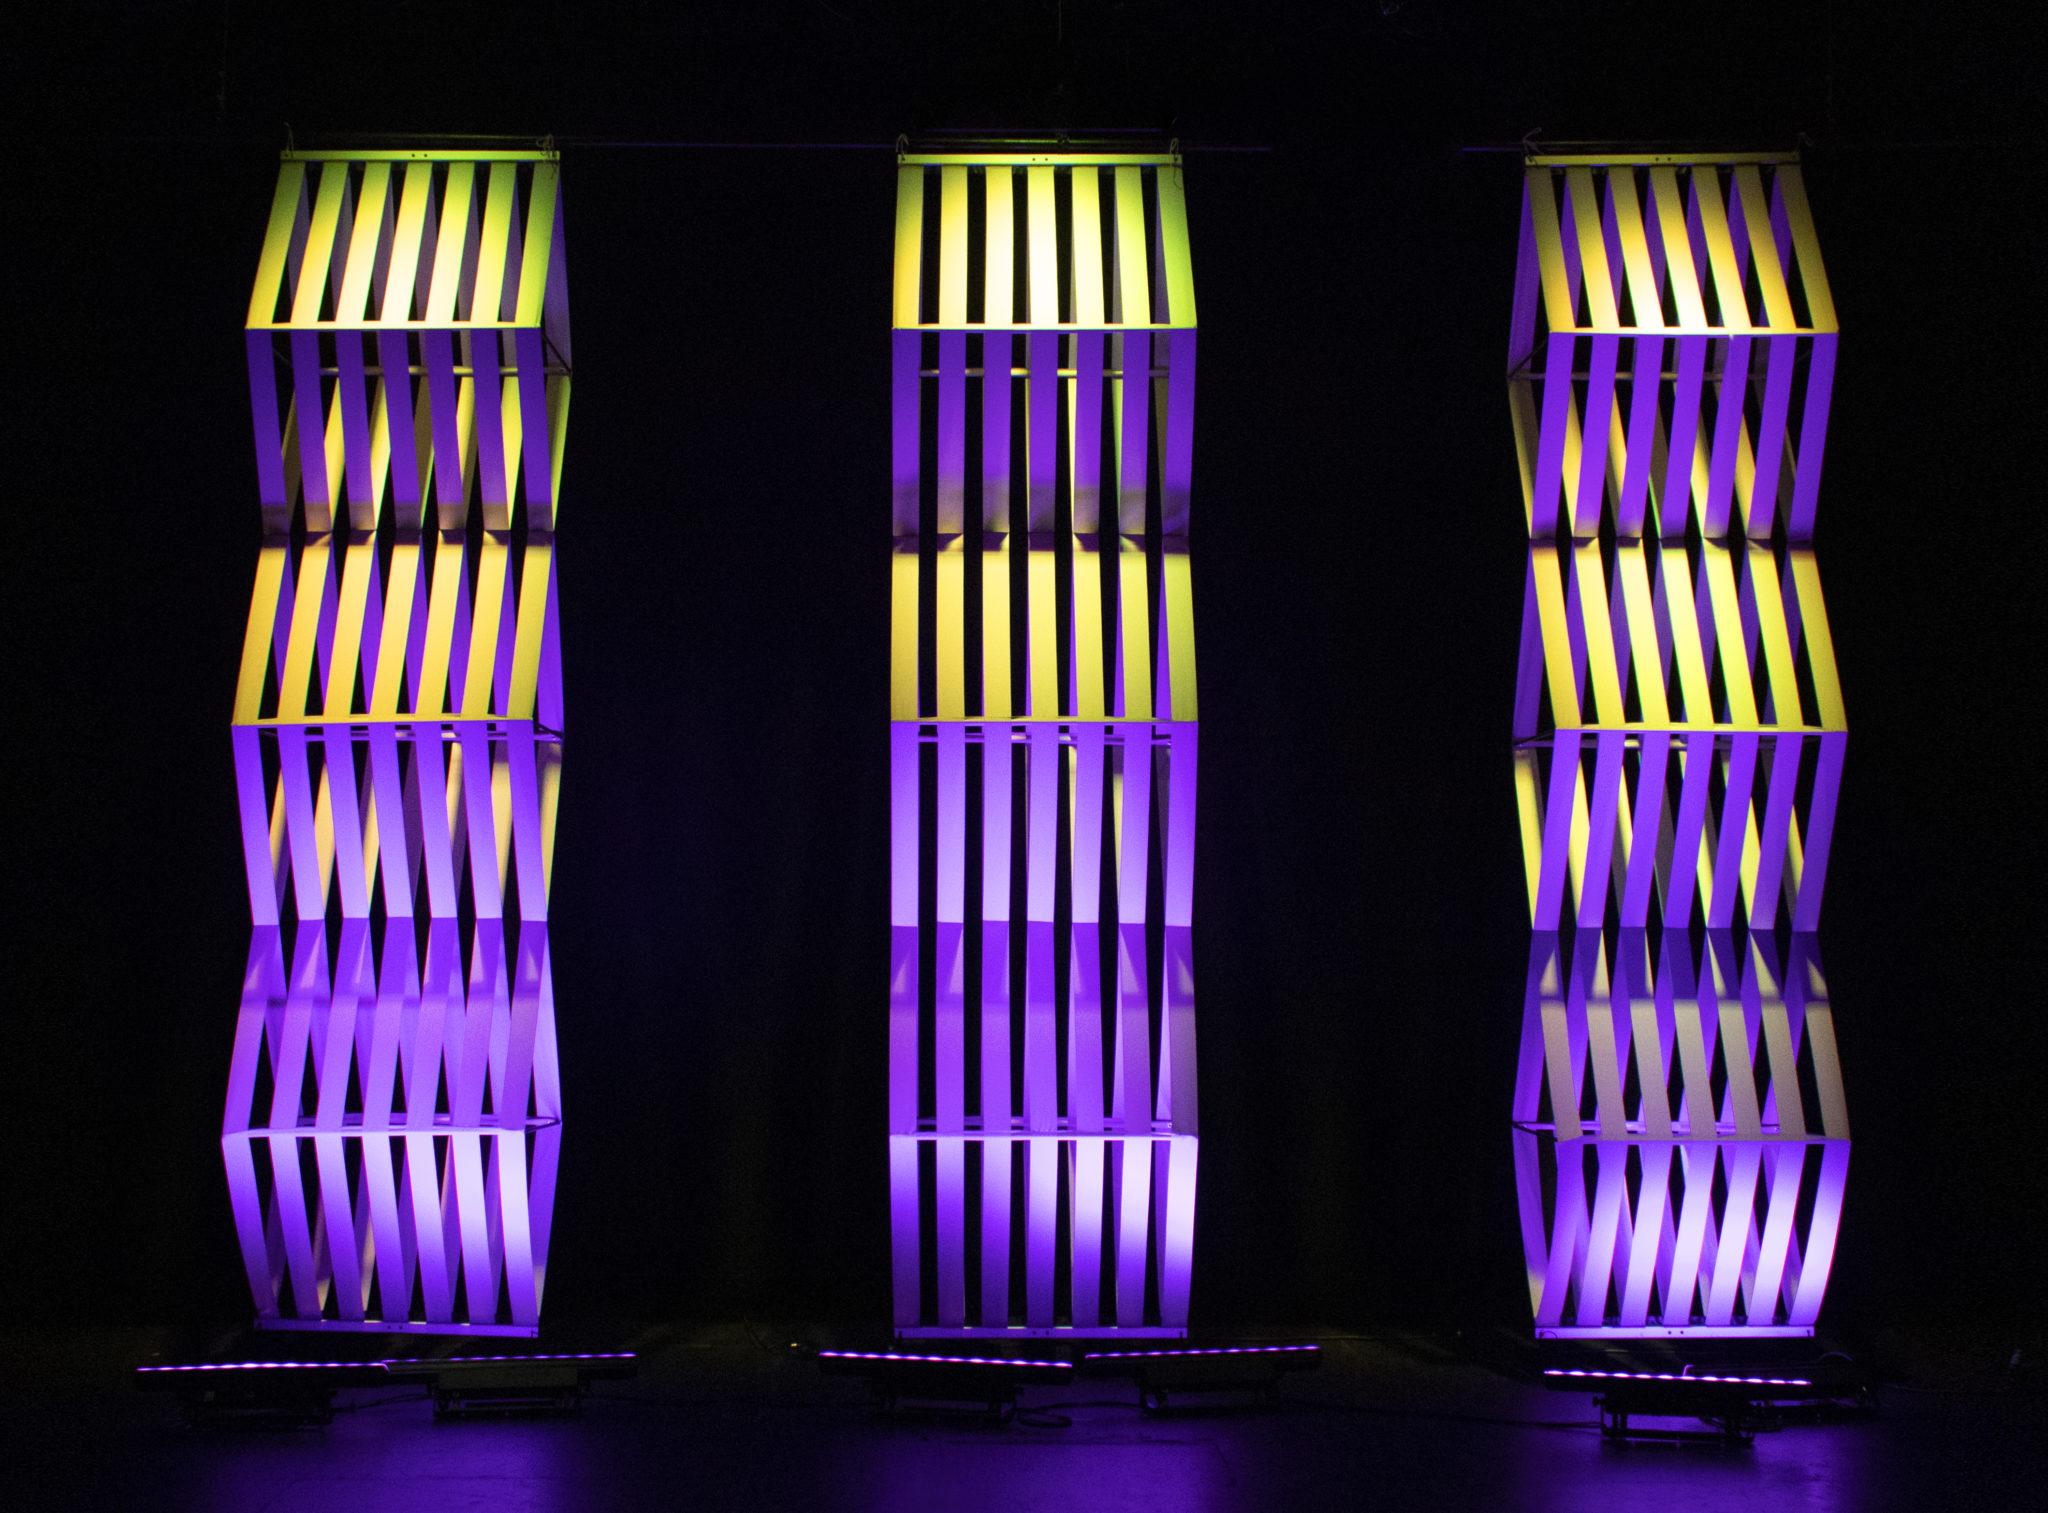 Zen panels light well on stage